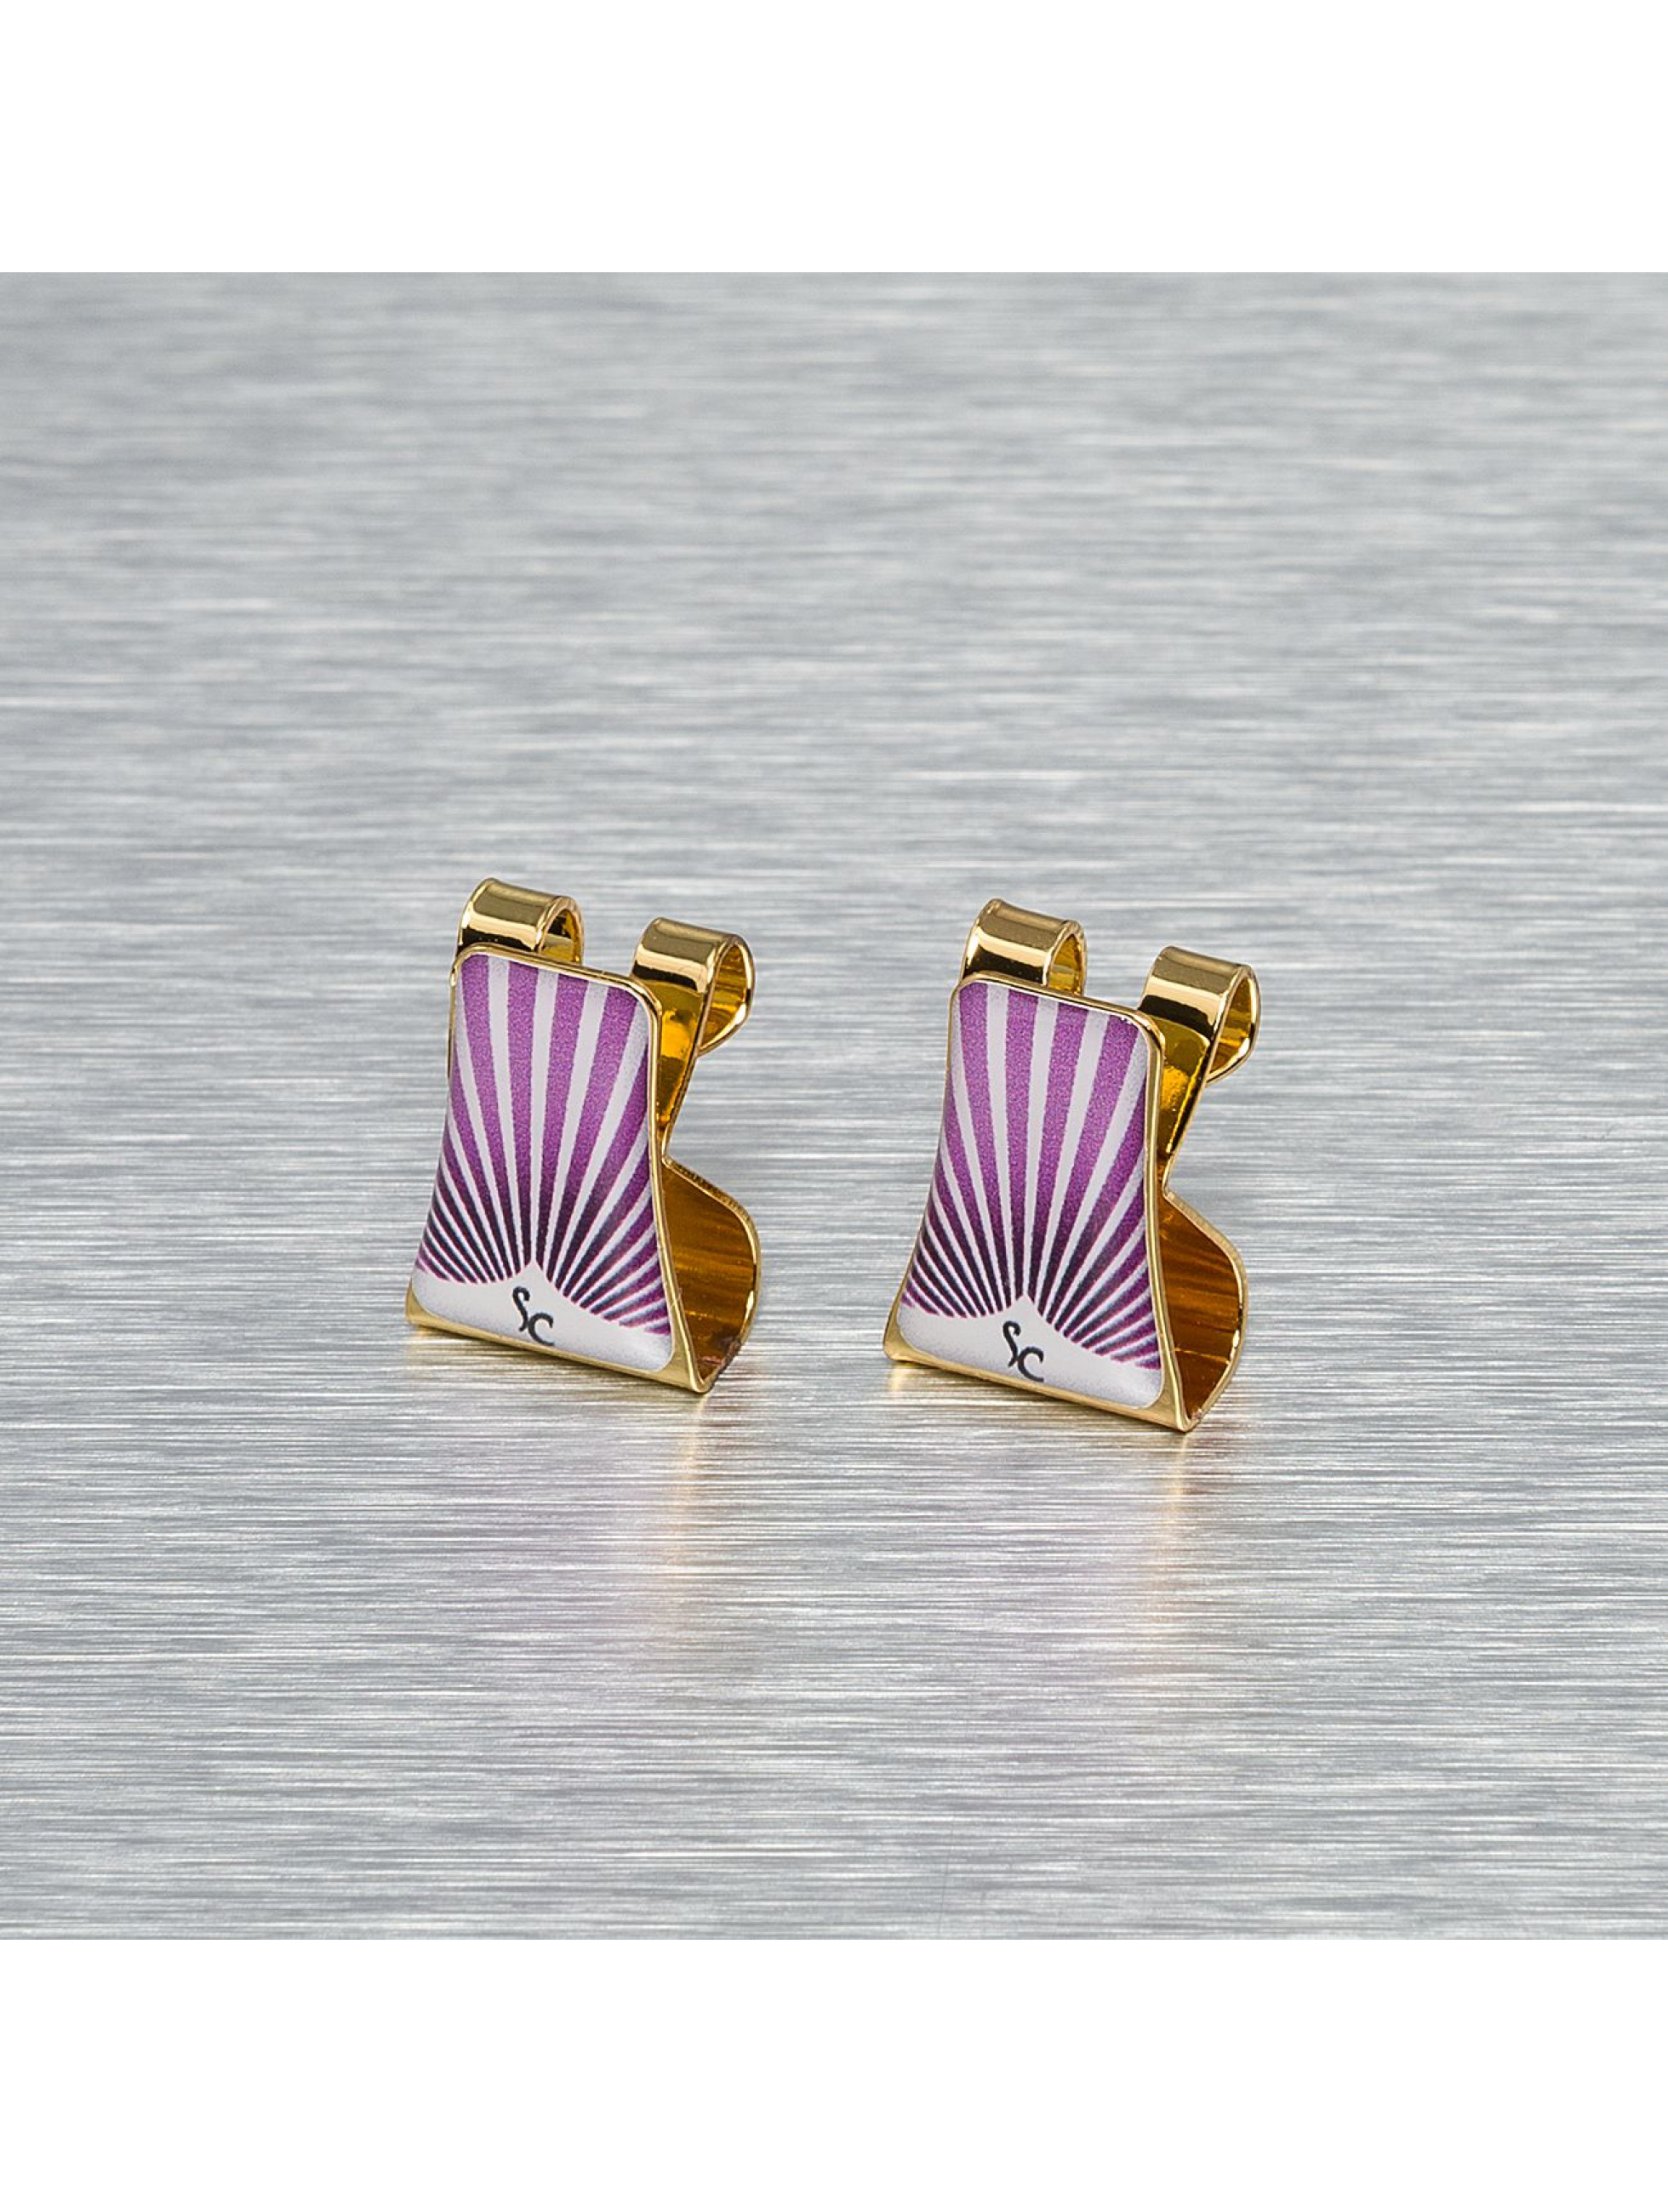 Skillclipz Sonstige Lady Lilatic violet